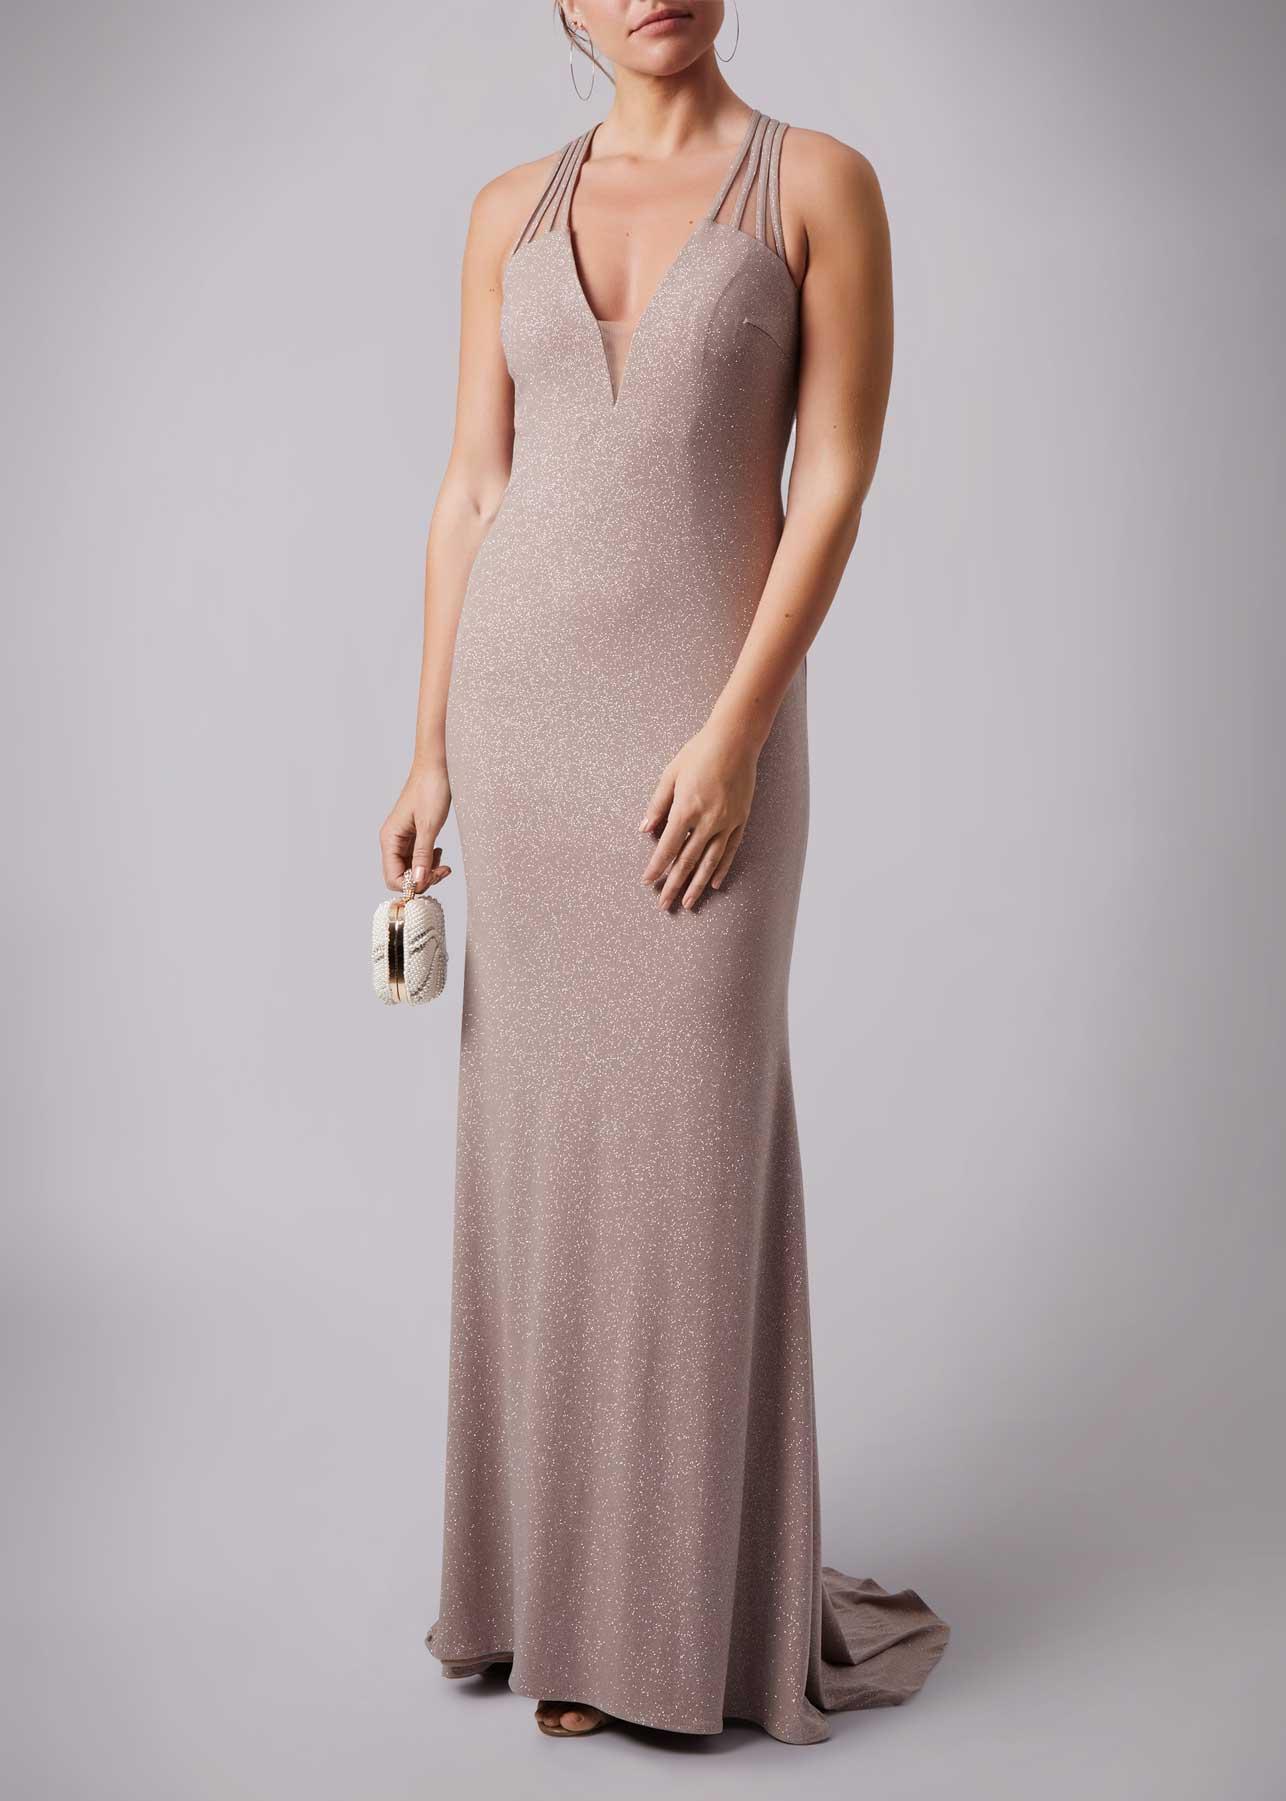 15 Cool Abendkleid Mascara Bester Preis15 Leicht Abendkleid Mascara Design